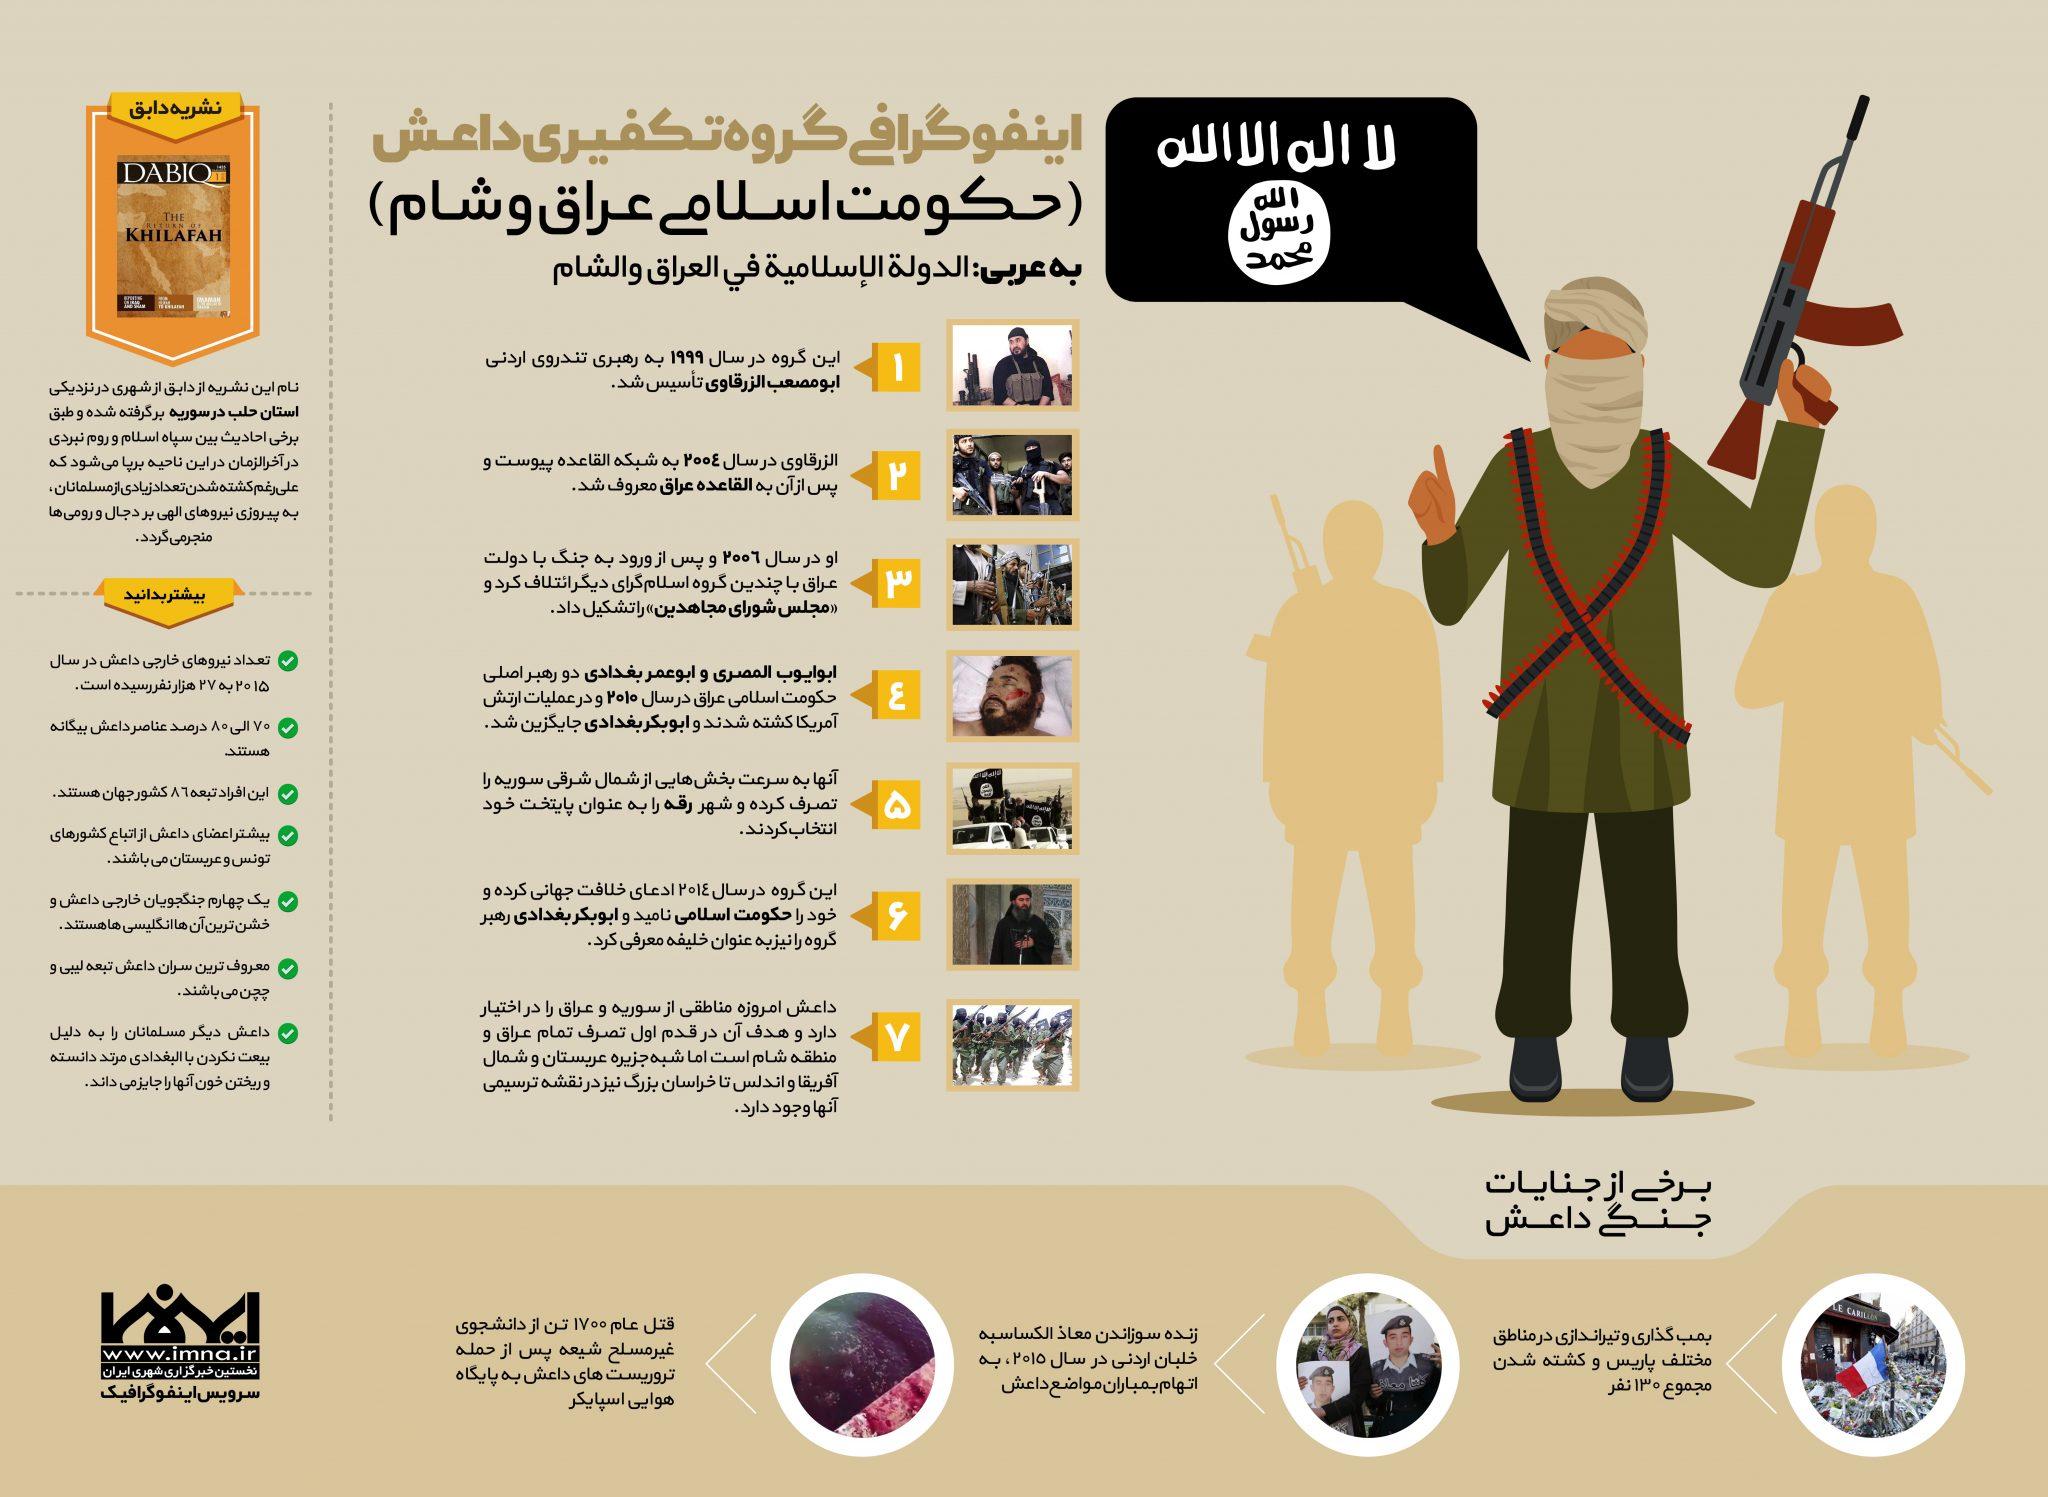 اینفوگرافیک گروه تکفیری داعش